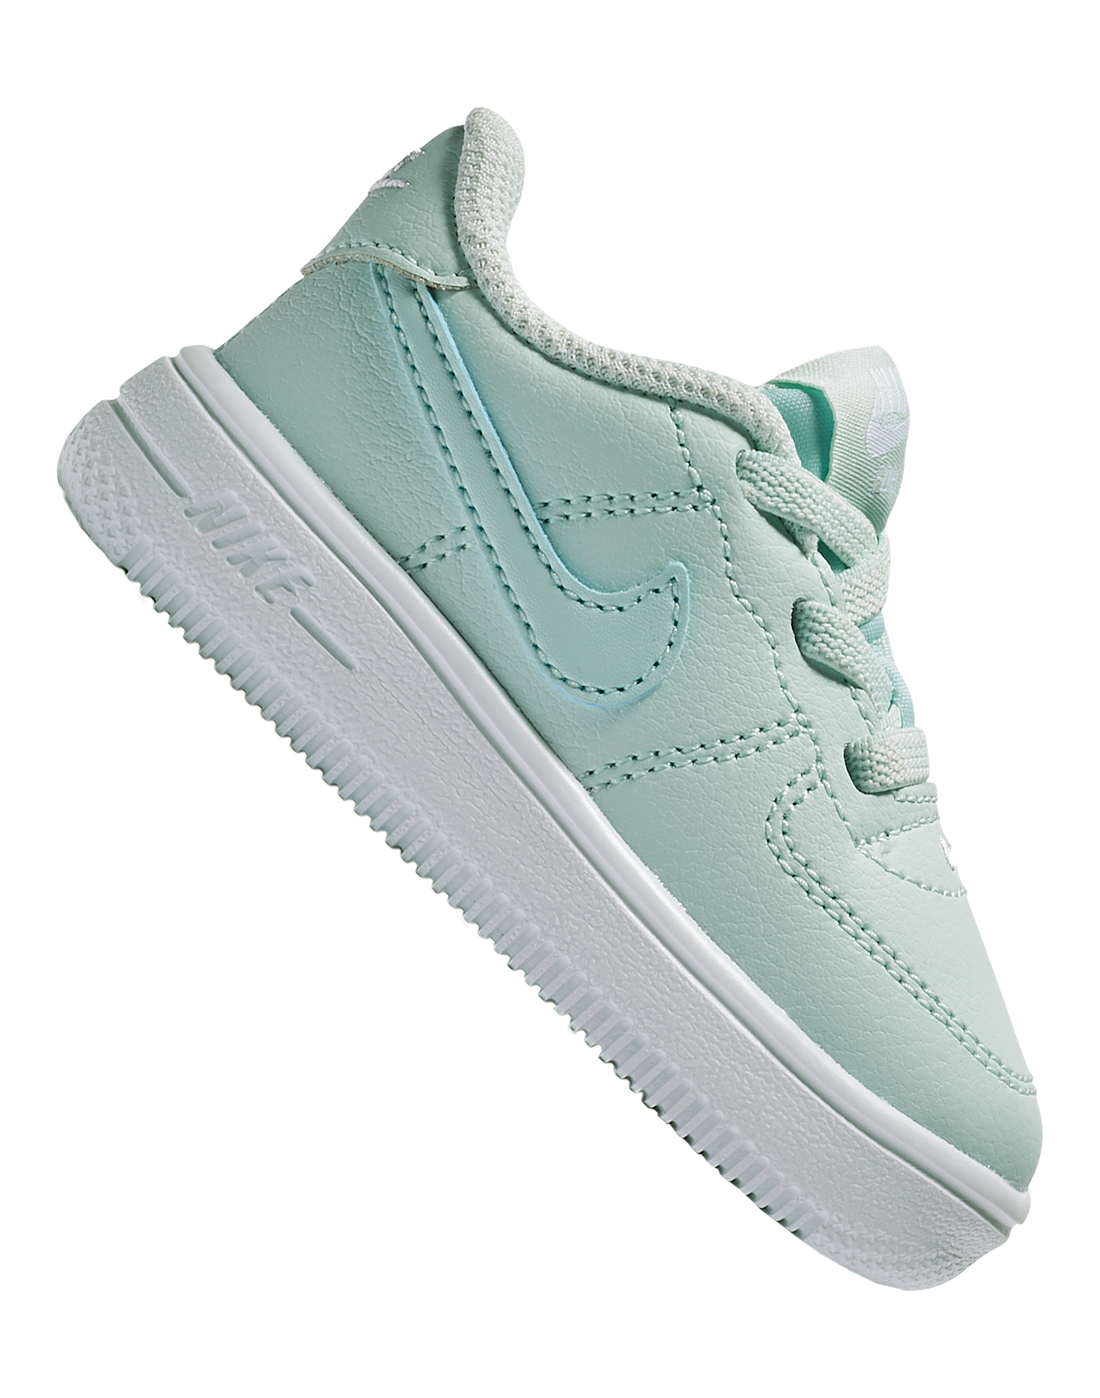 39068c0715413 Infant Boy s Green Nike Air Force 1